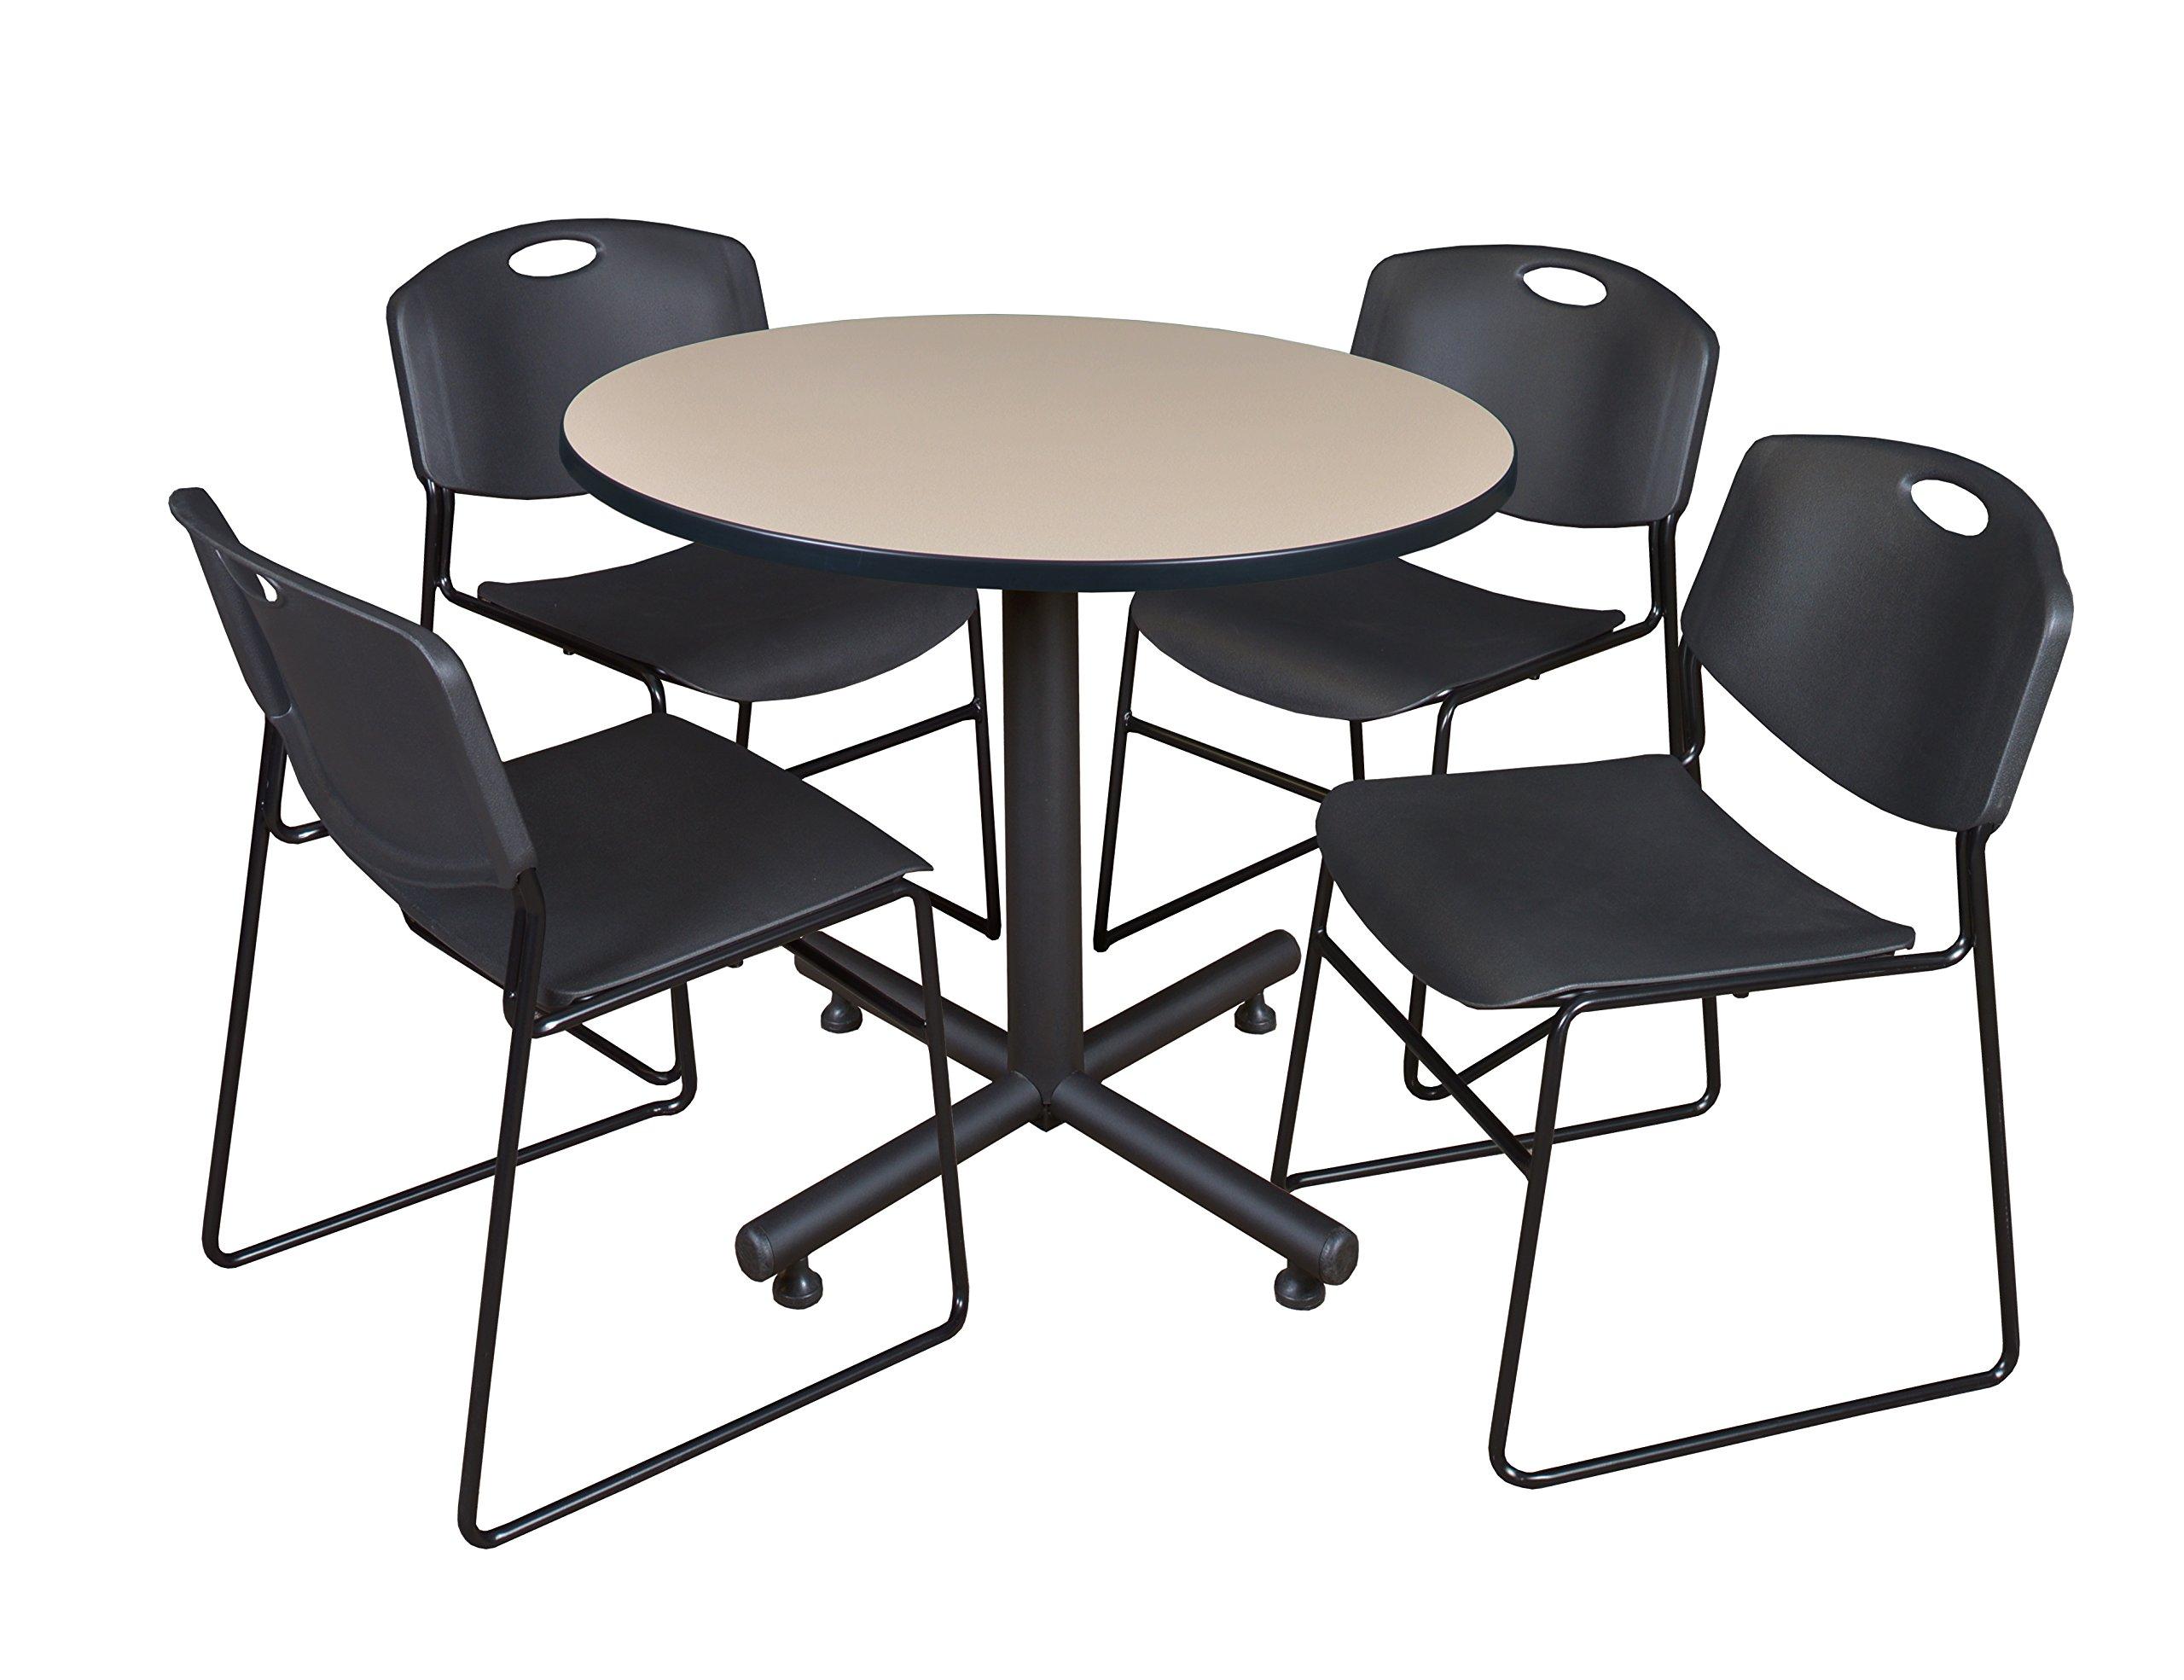 Regency Kobe 42-Inch Round Breakroom Table, Beige, and 4 Zeng Stack Chairs, Black